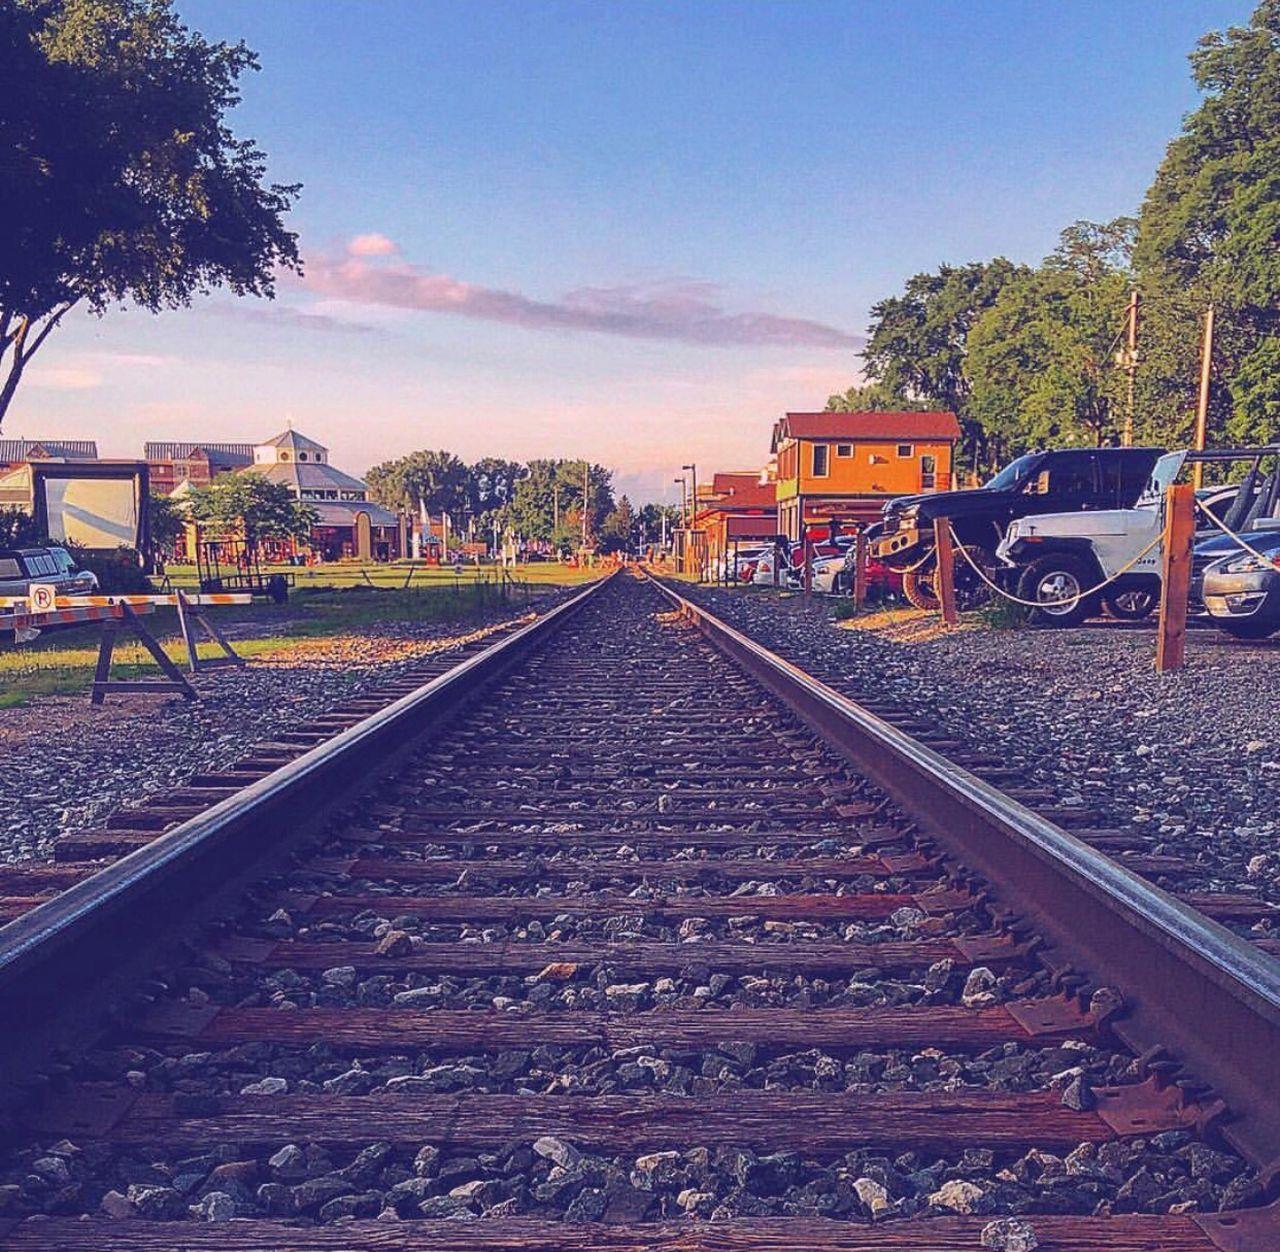 railroad track, rail transportation, transportation, no people, sky, day, outdoors, tree, nature